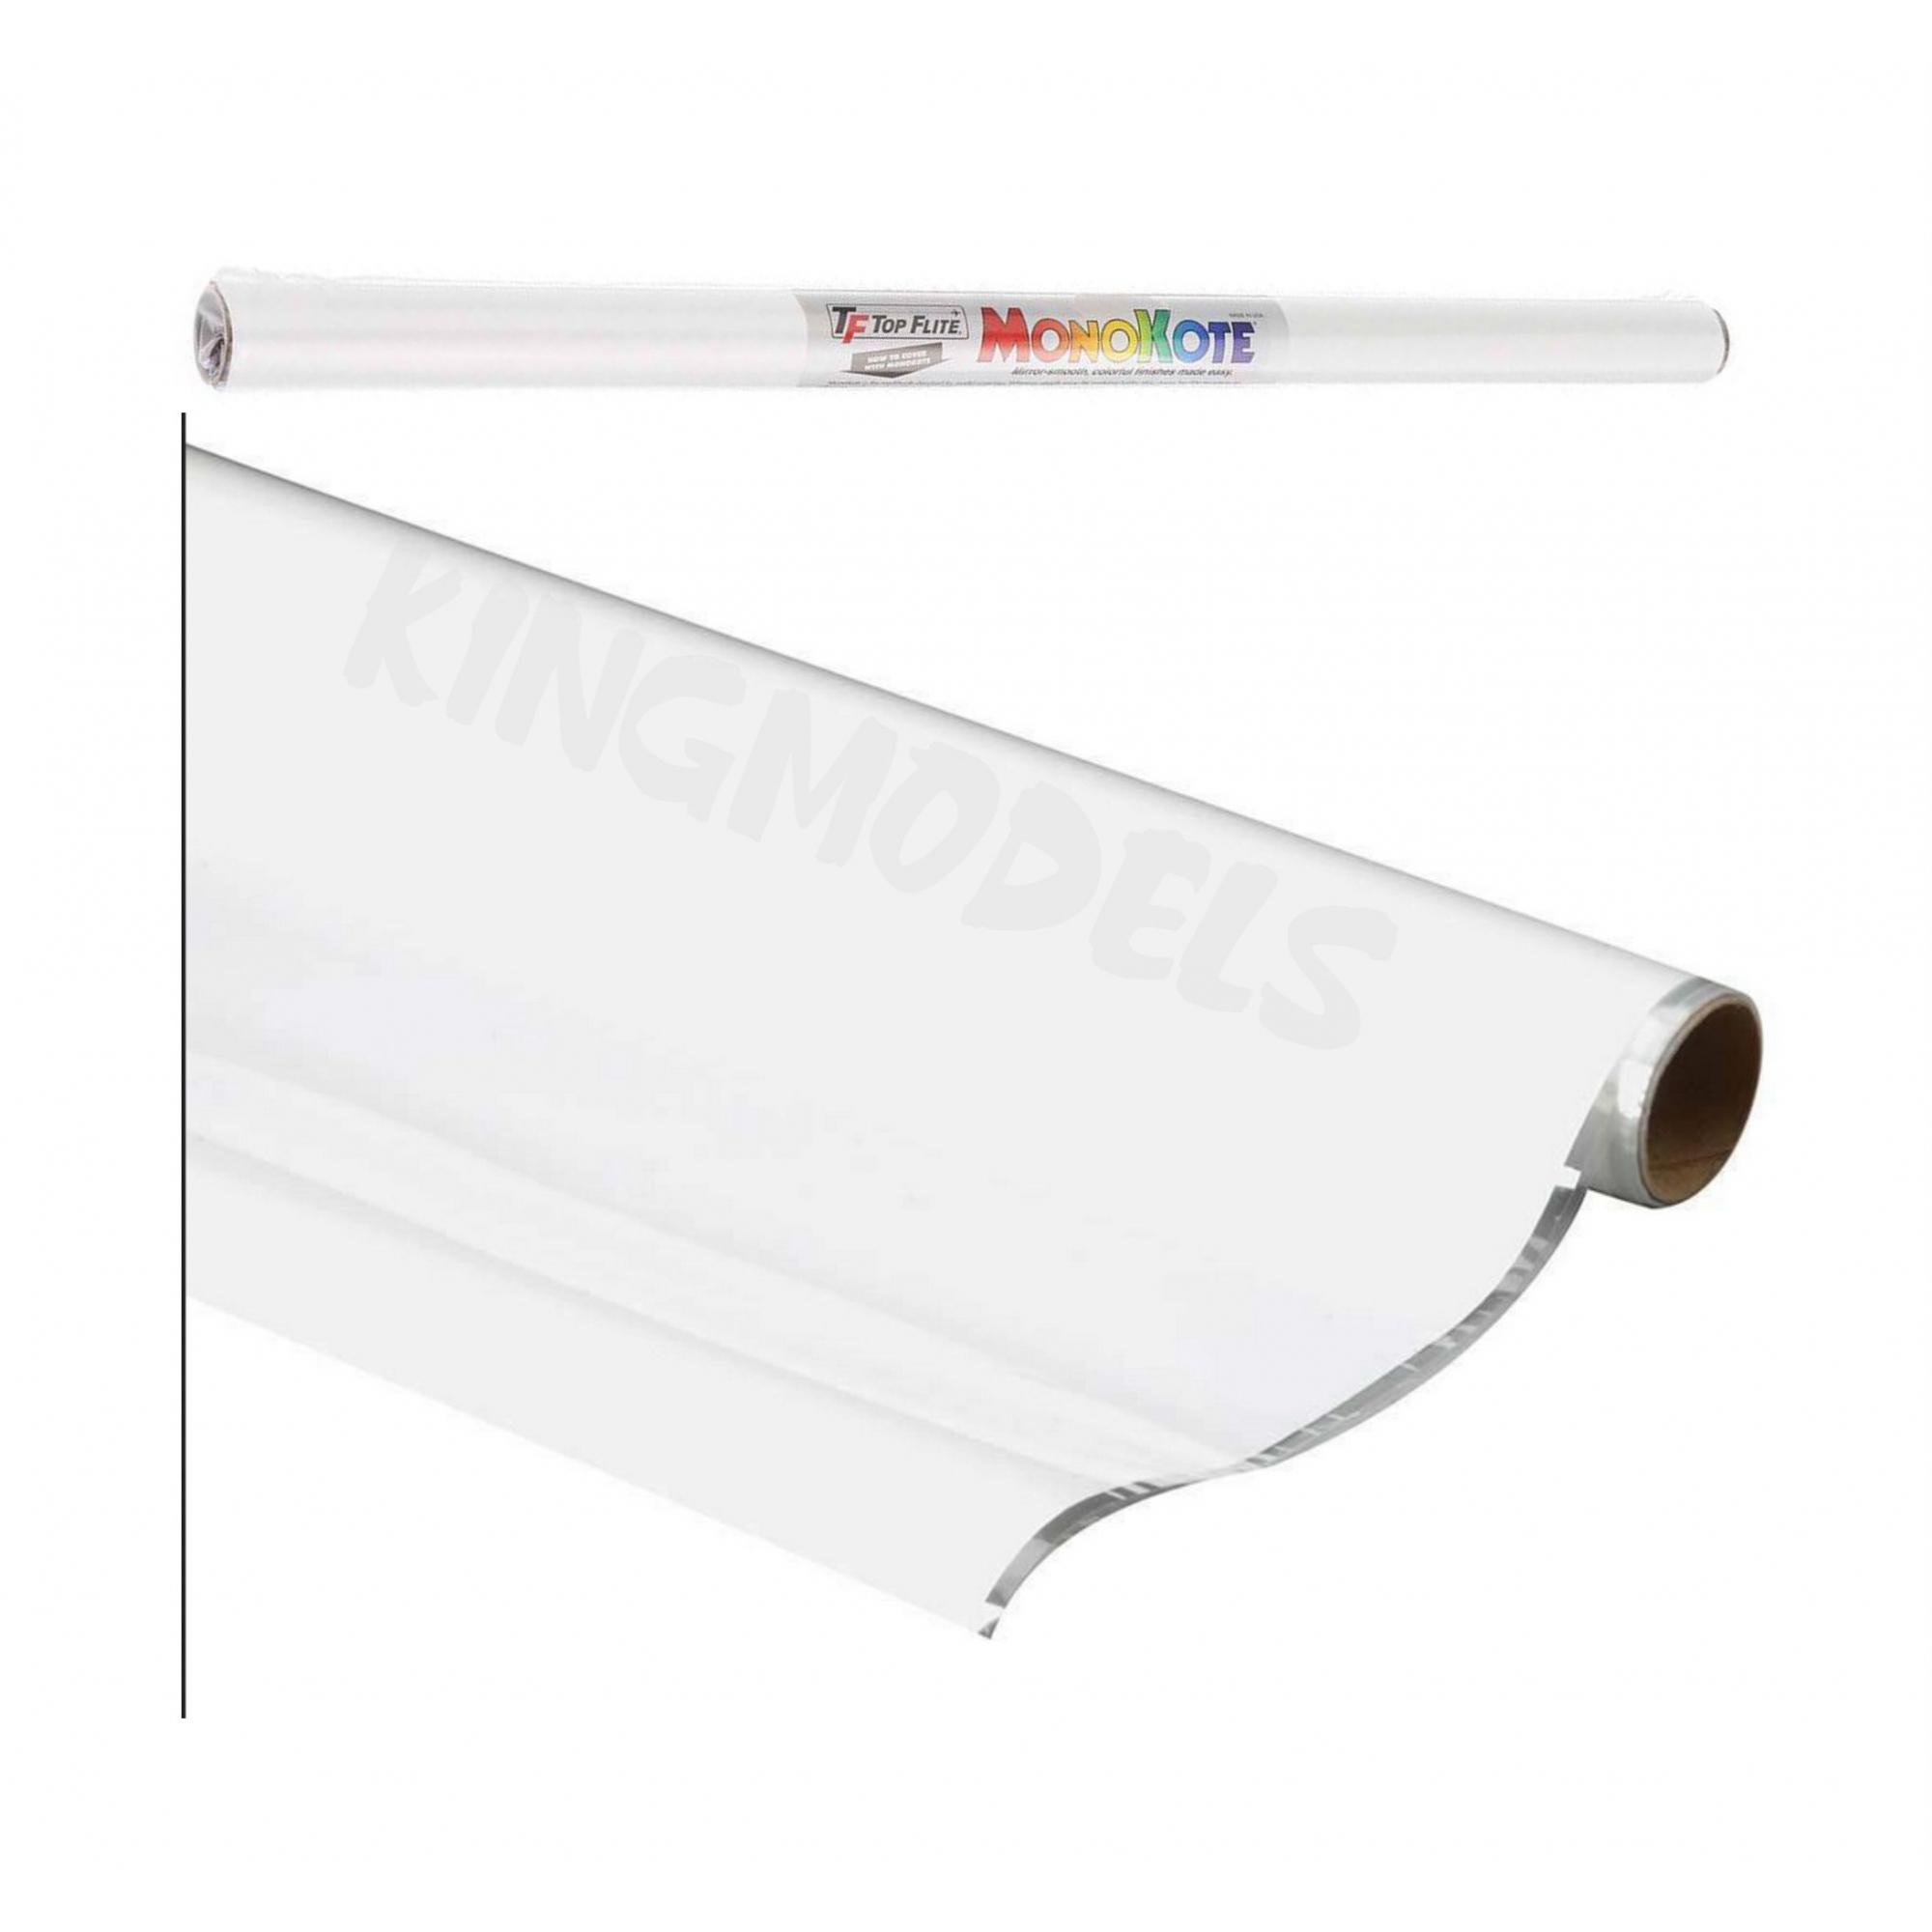 Monokote Topflite(genuino) - Branco - Topq0204  - King Models